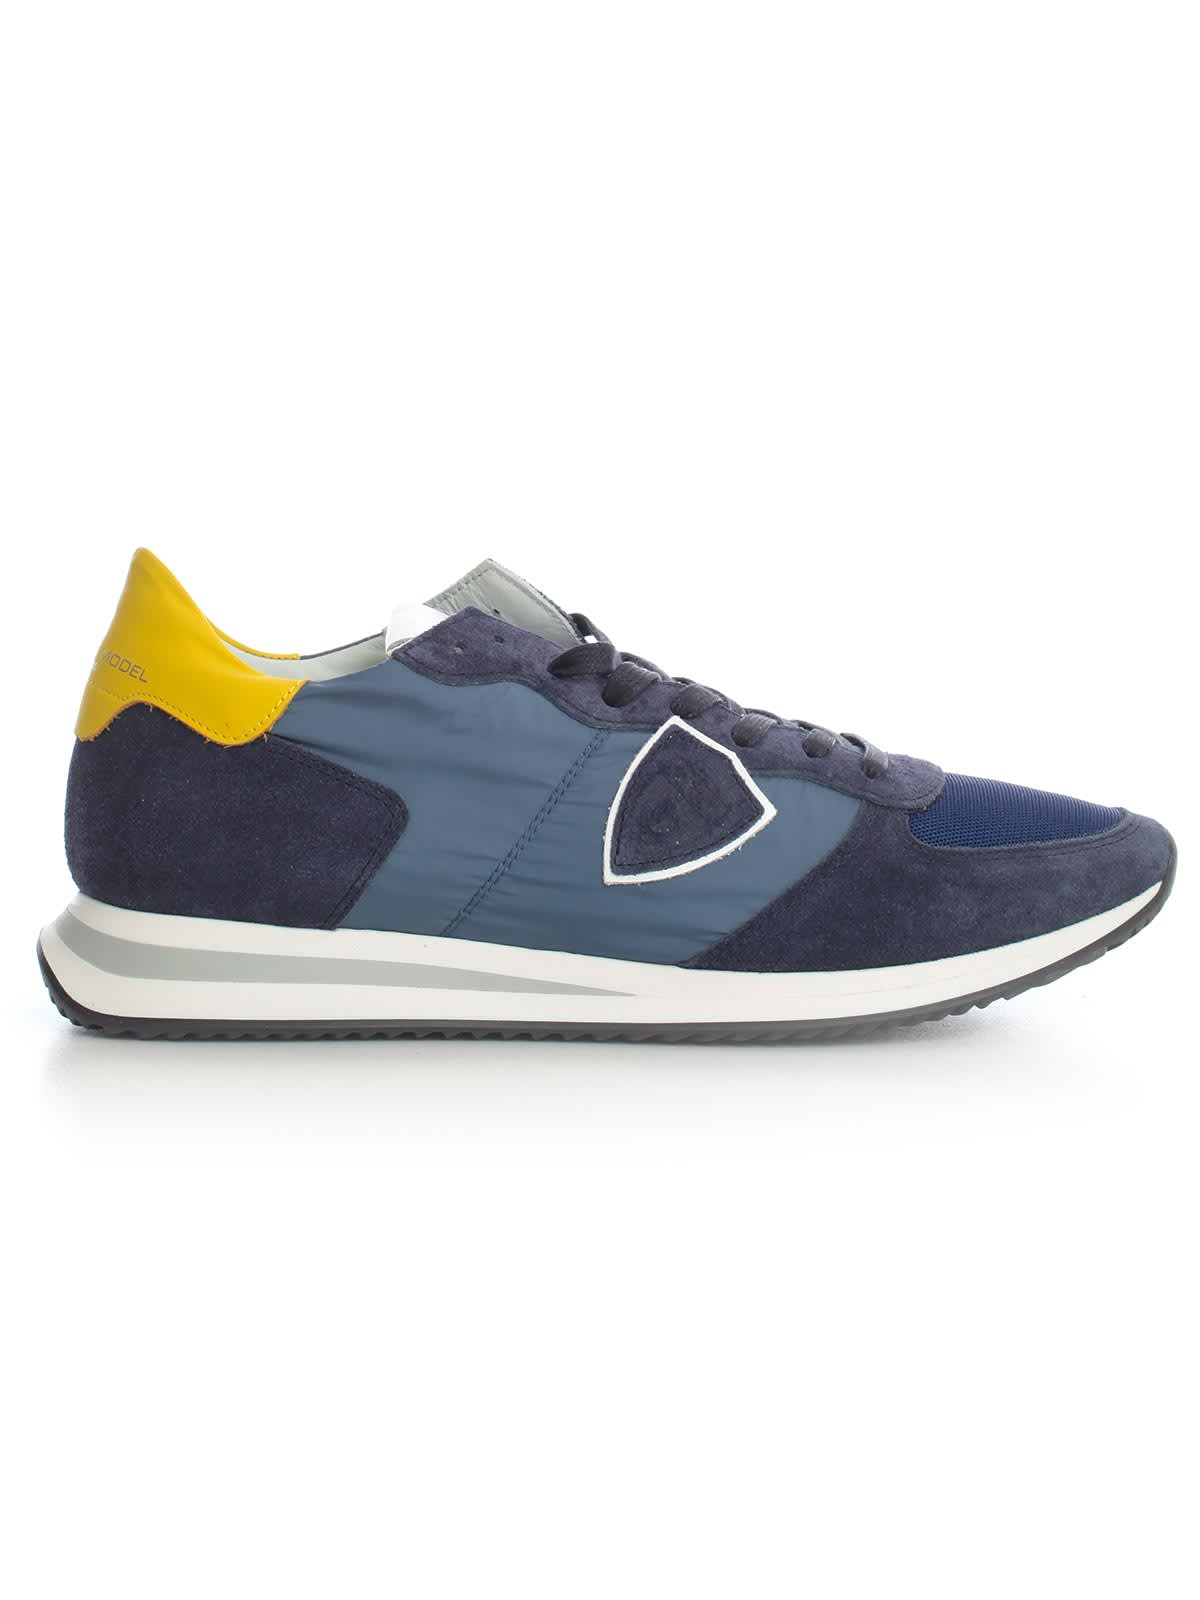 Philippe Model Trpx Sneakers Blue W/yellow Heel